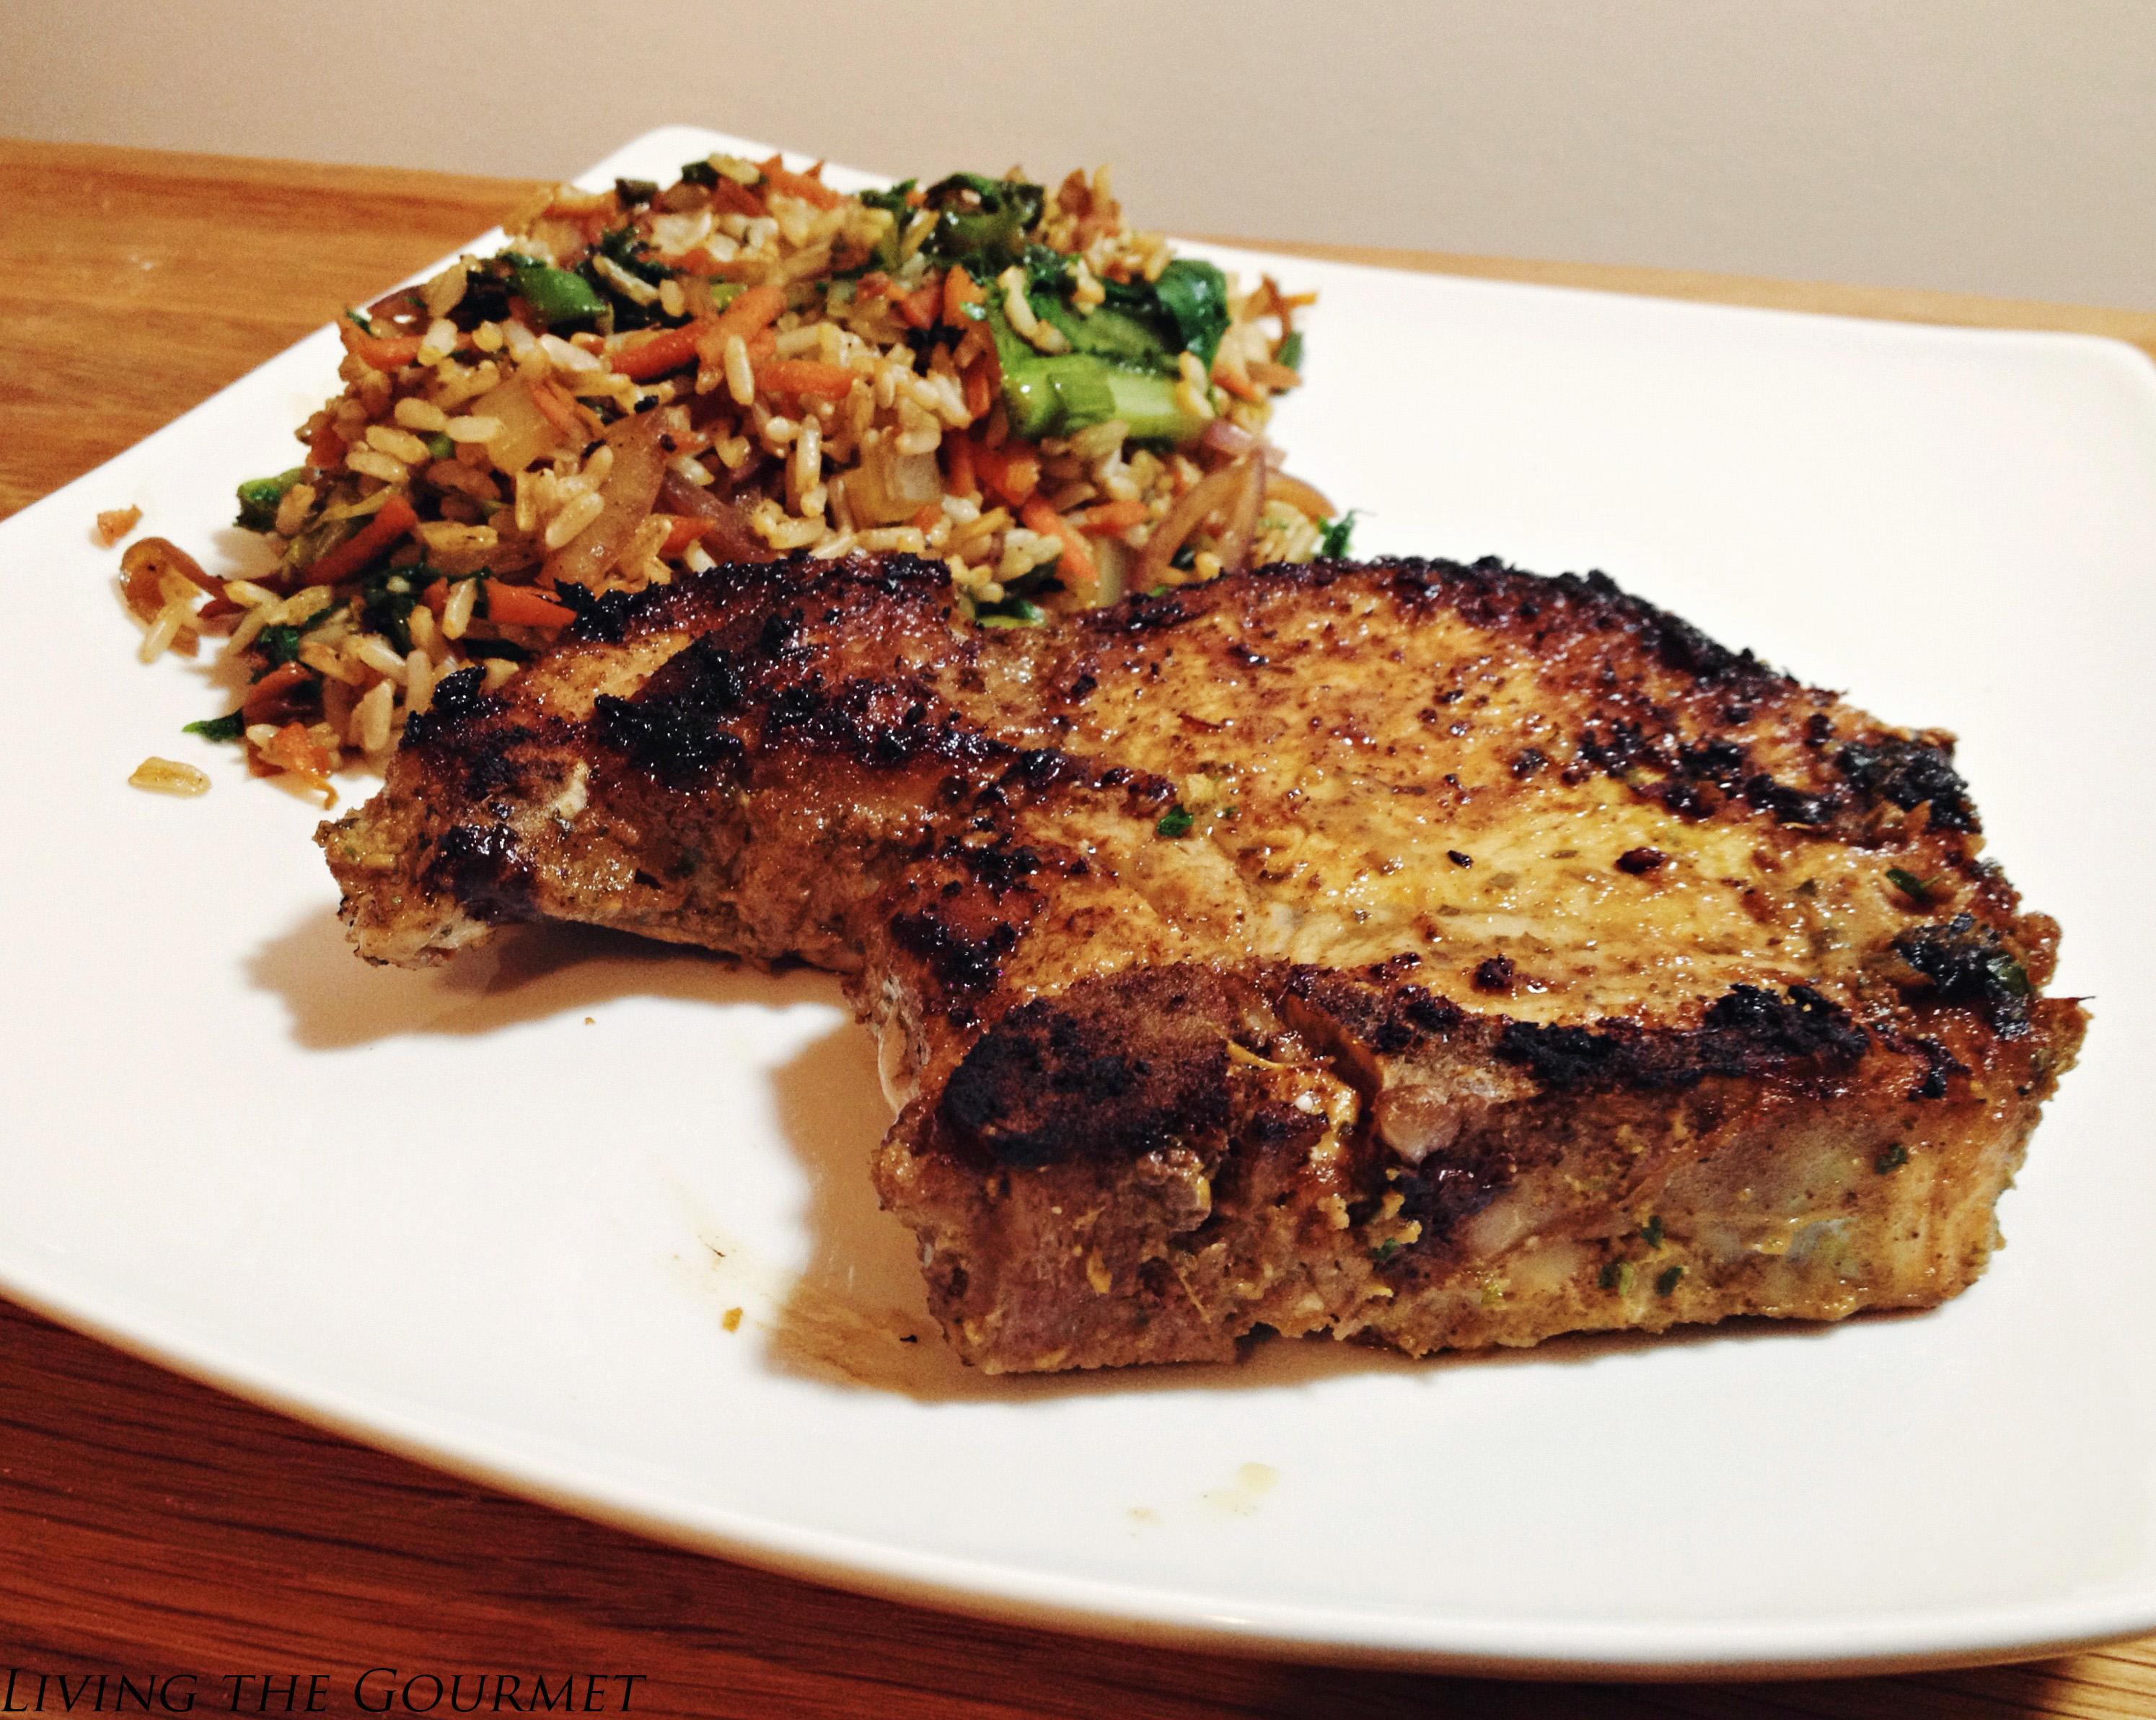 Living the Gourmet: Ginger & Mustard Pork Chops w/ Swiss Chard & Rice